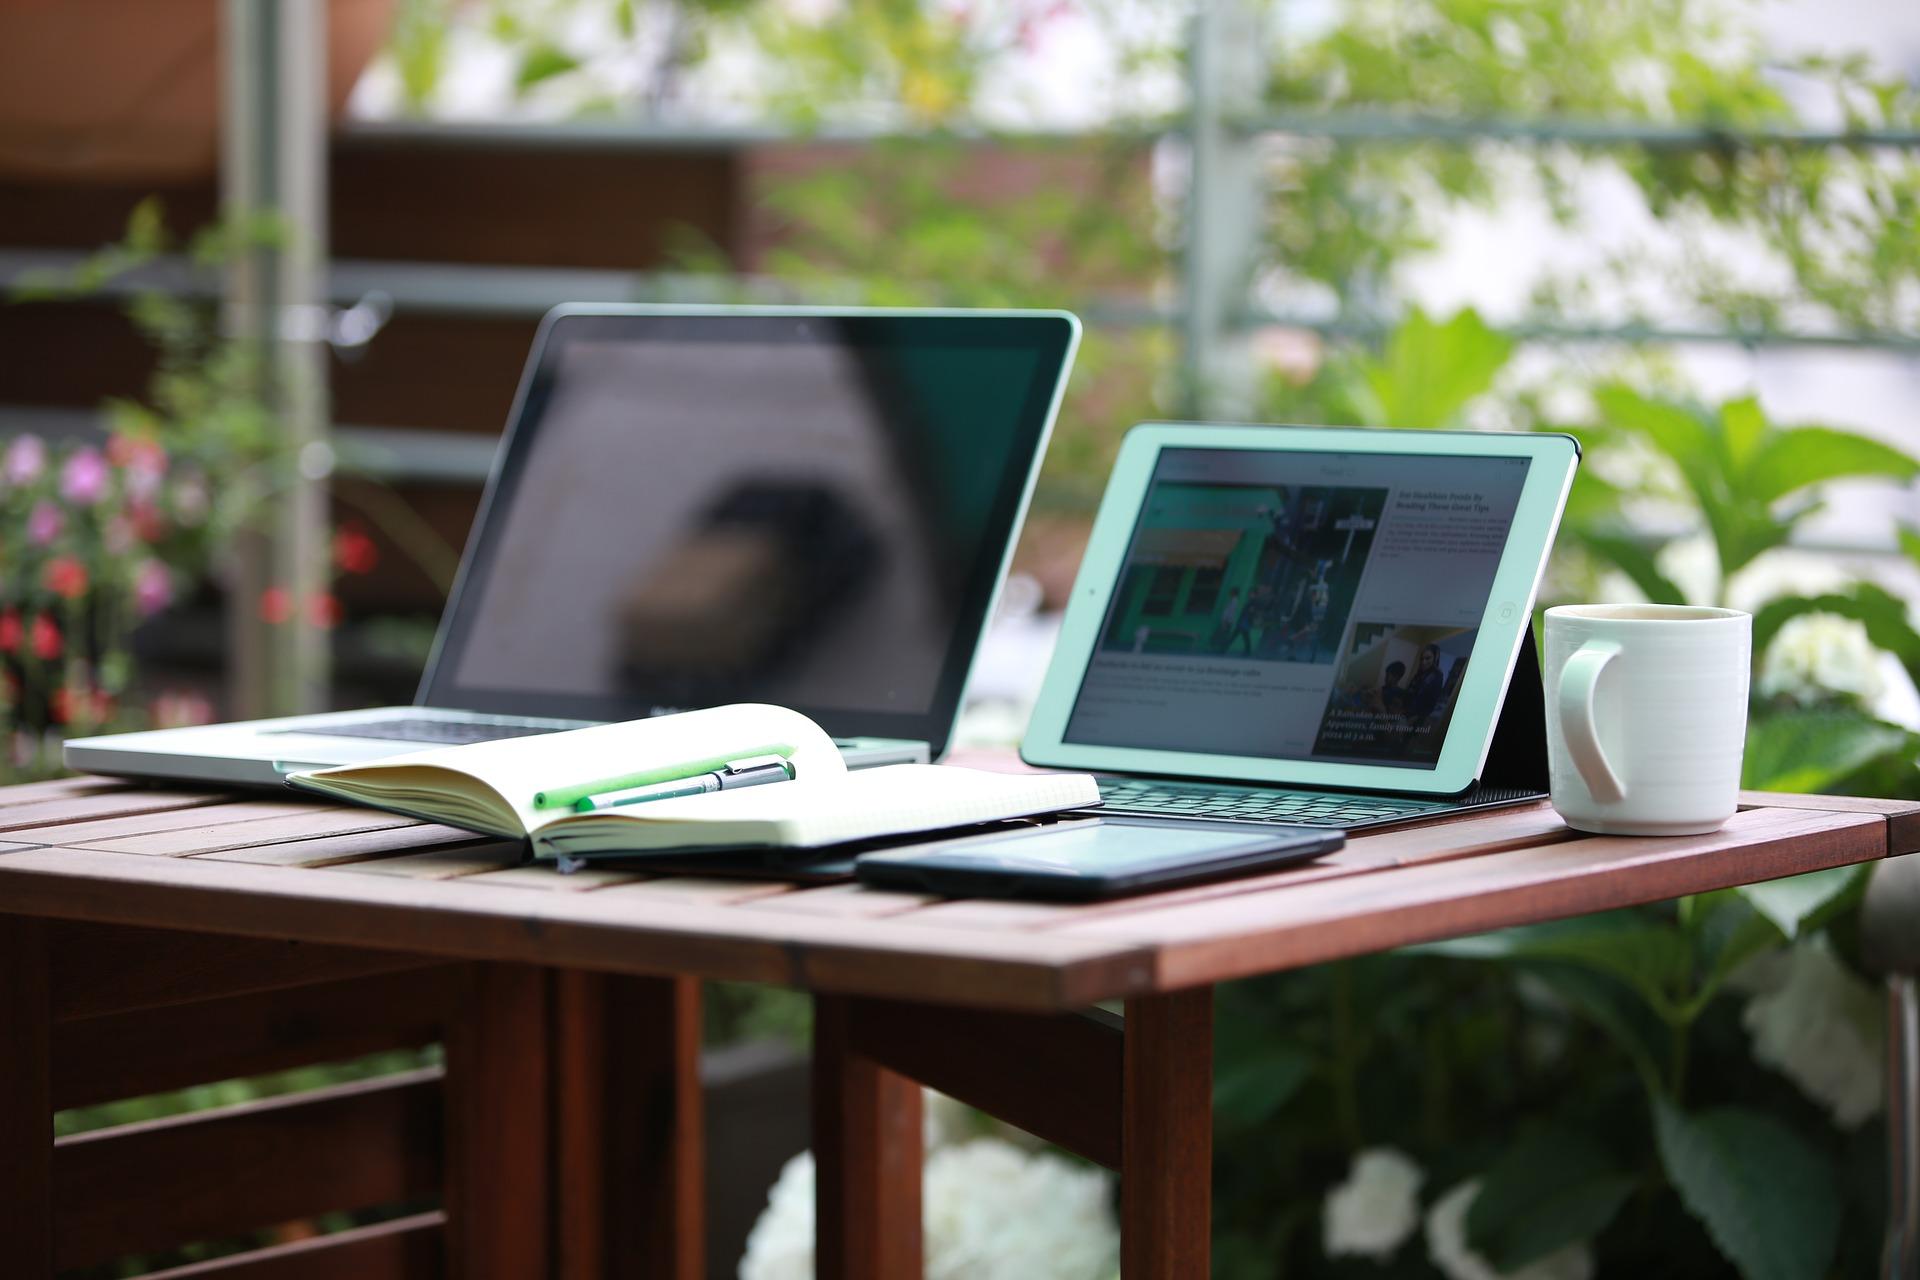 notebook - Javascriptでできることや初心者向けの勉強方法は?実用までの5ステップを解説